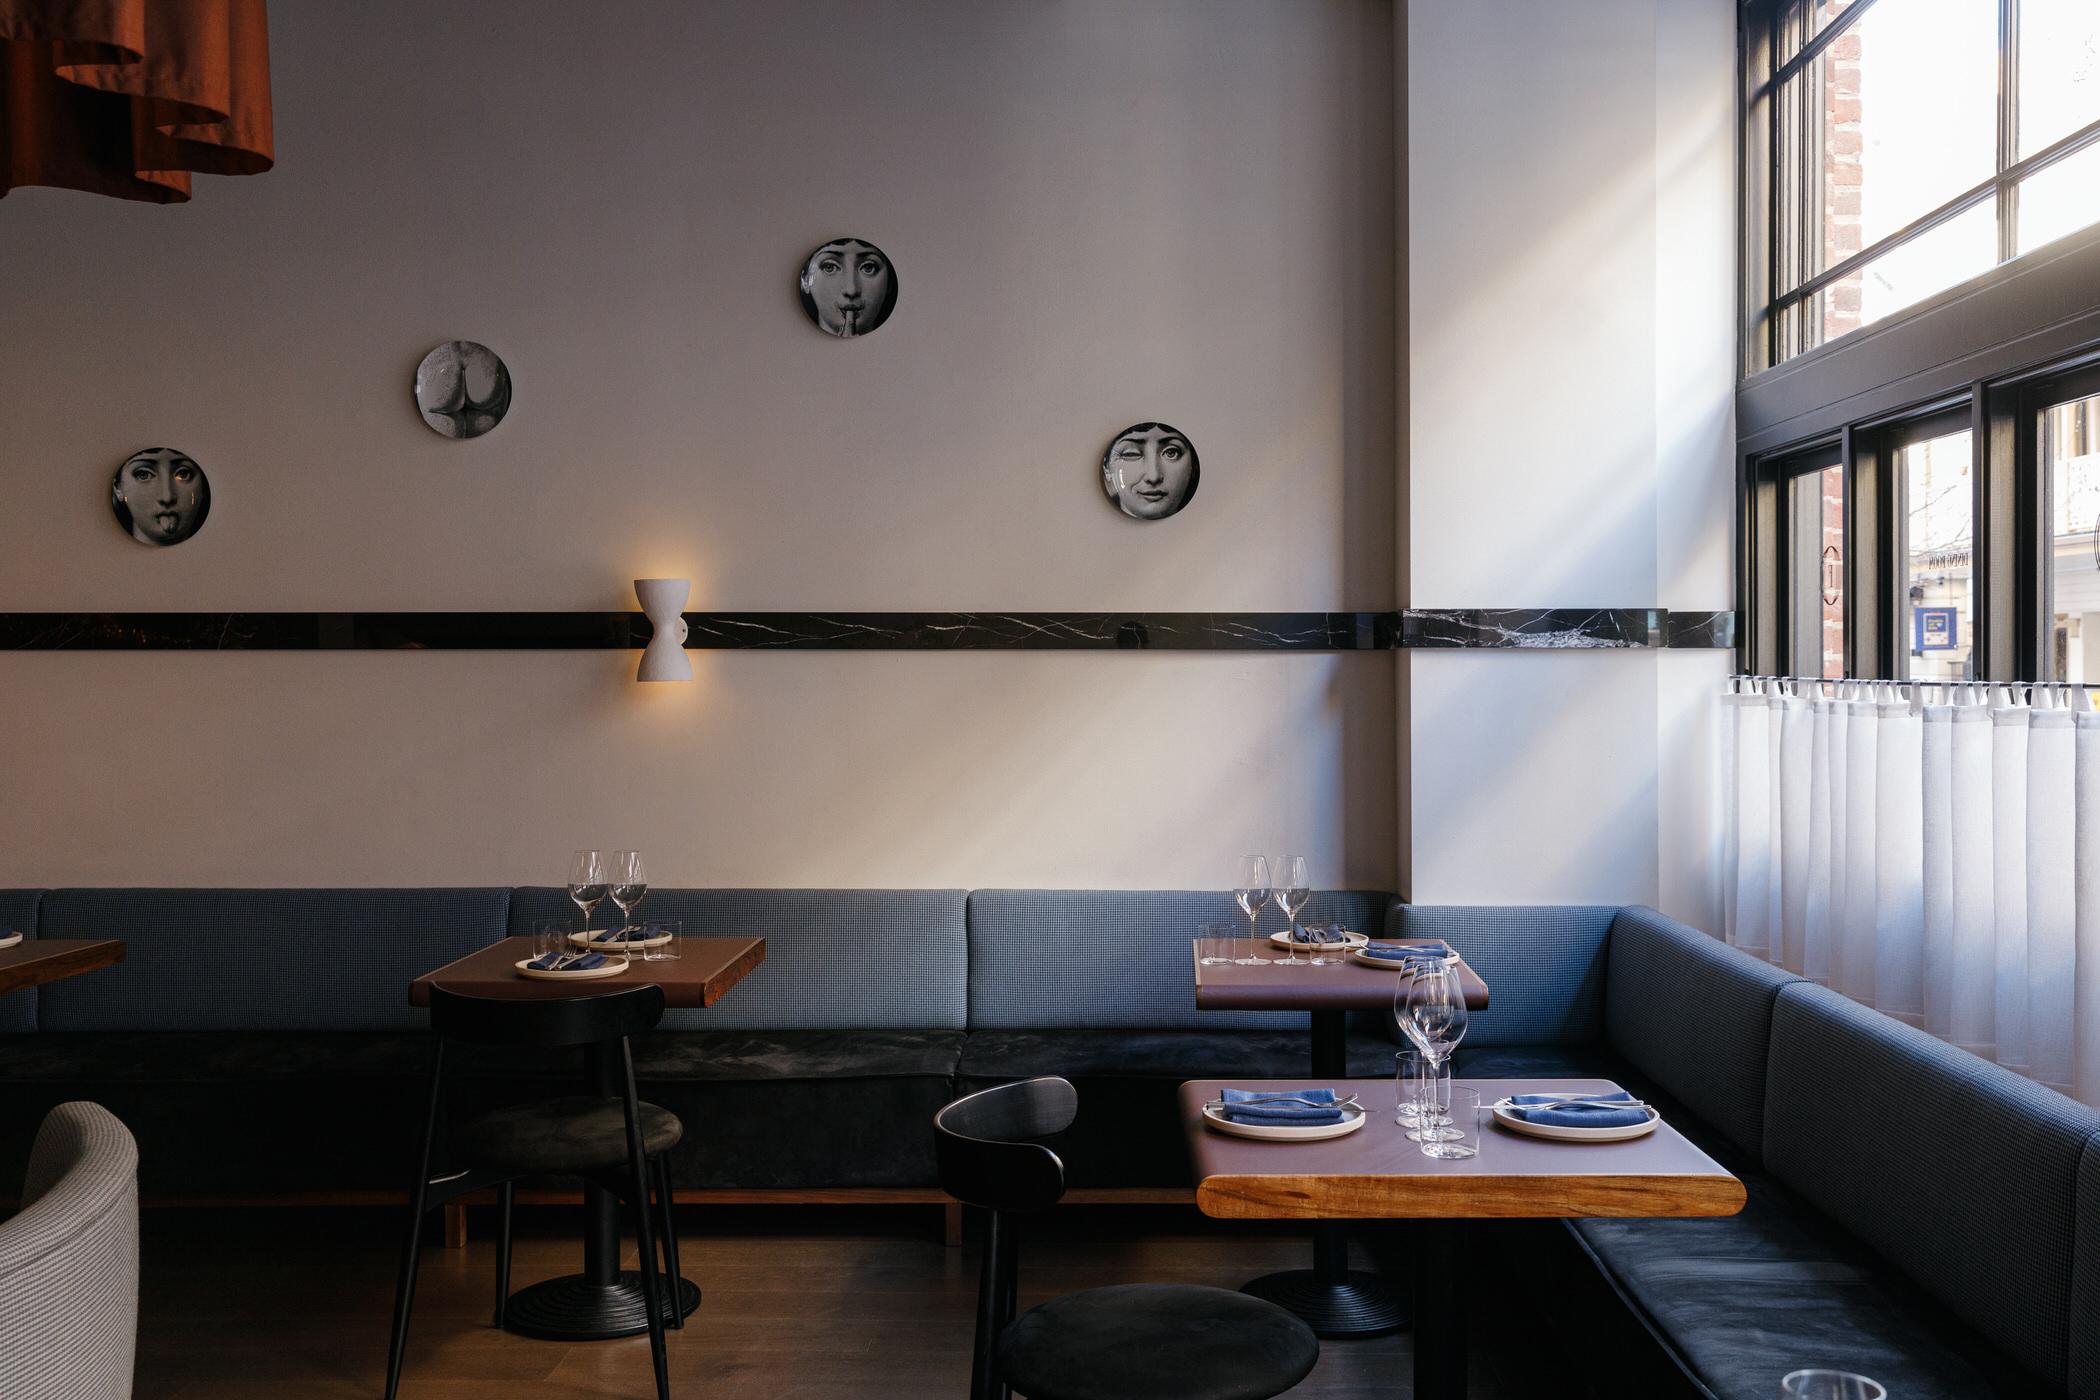 Studio Gram Fugazzi Adelaide Restaurant Bar Photo Jonathan Vdk Yellowtrace 26